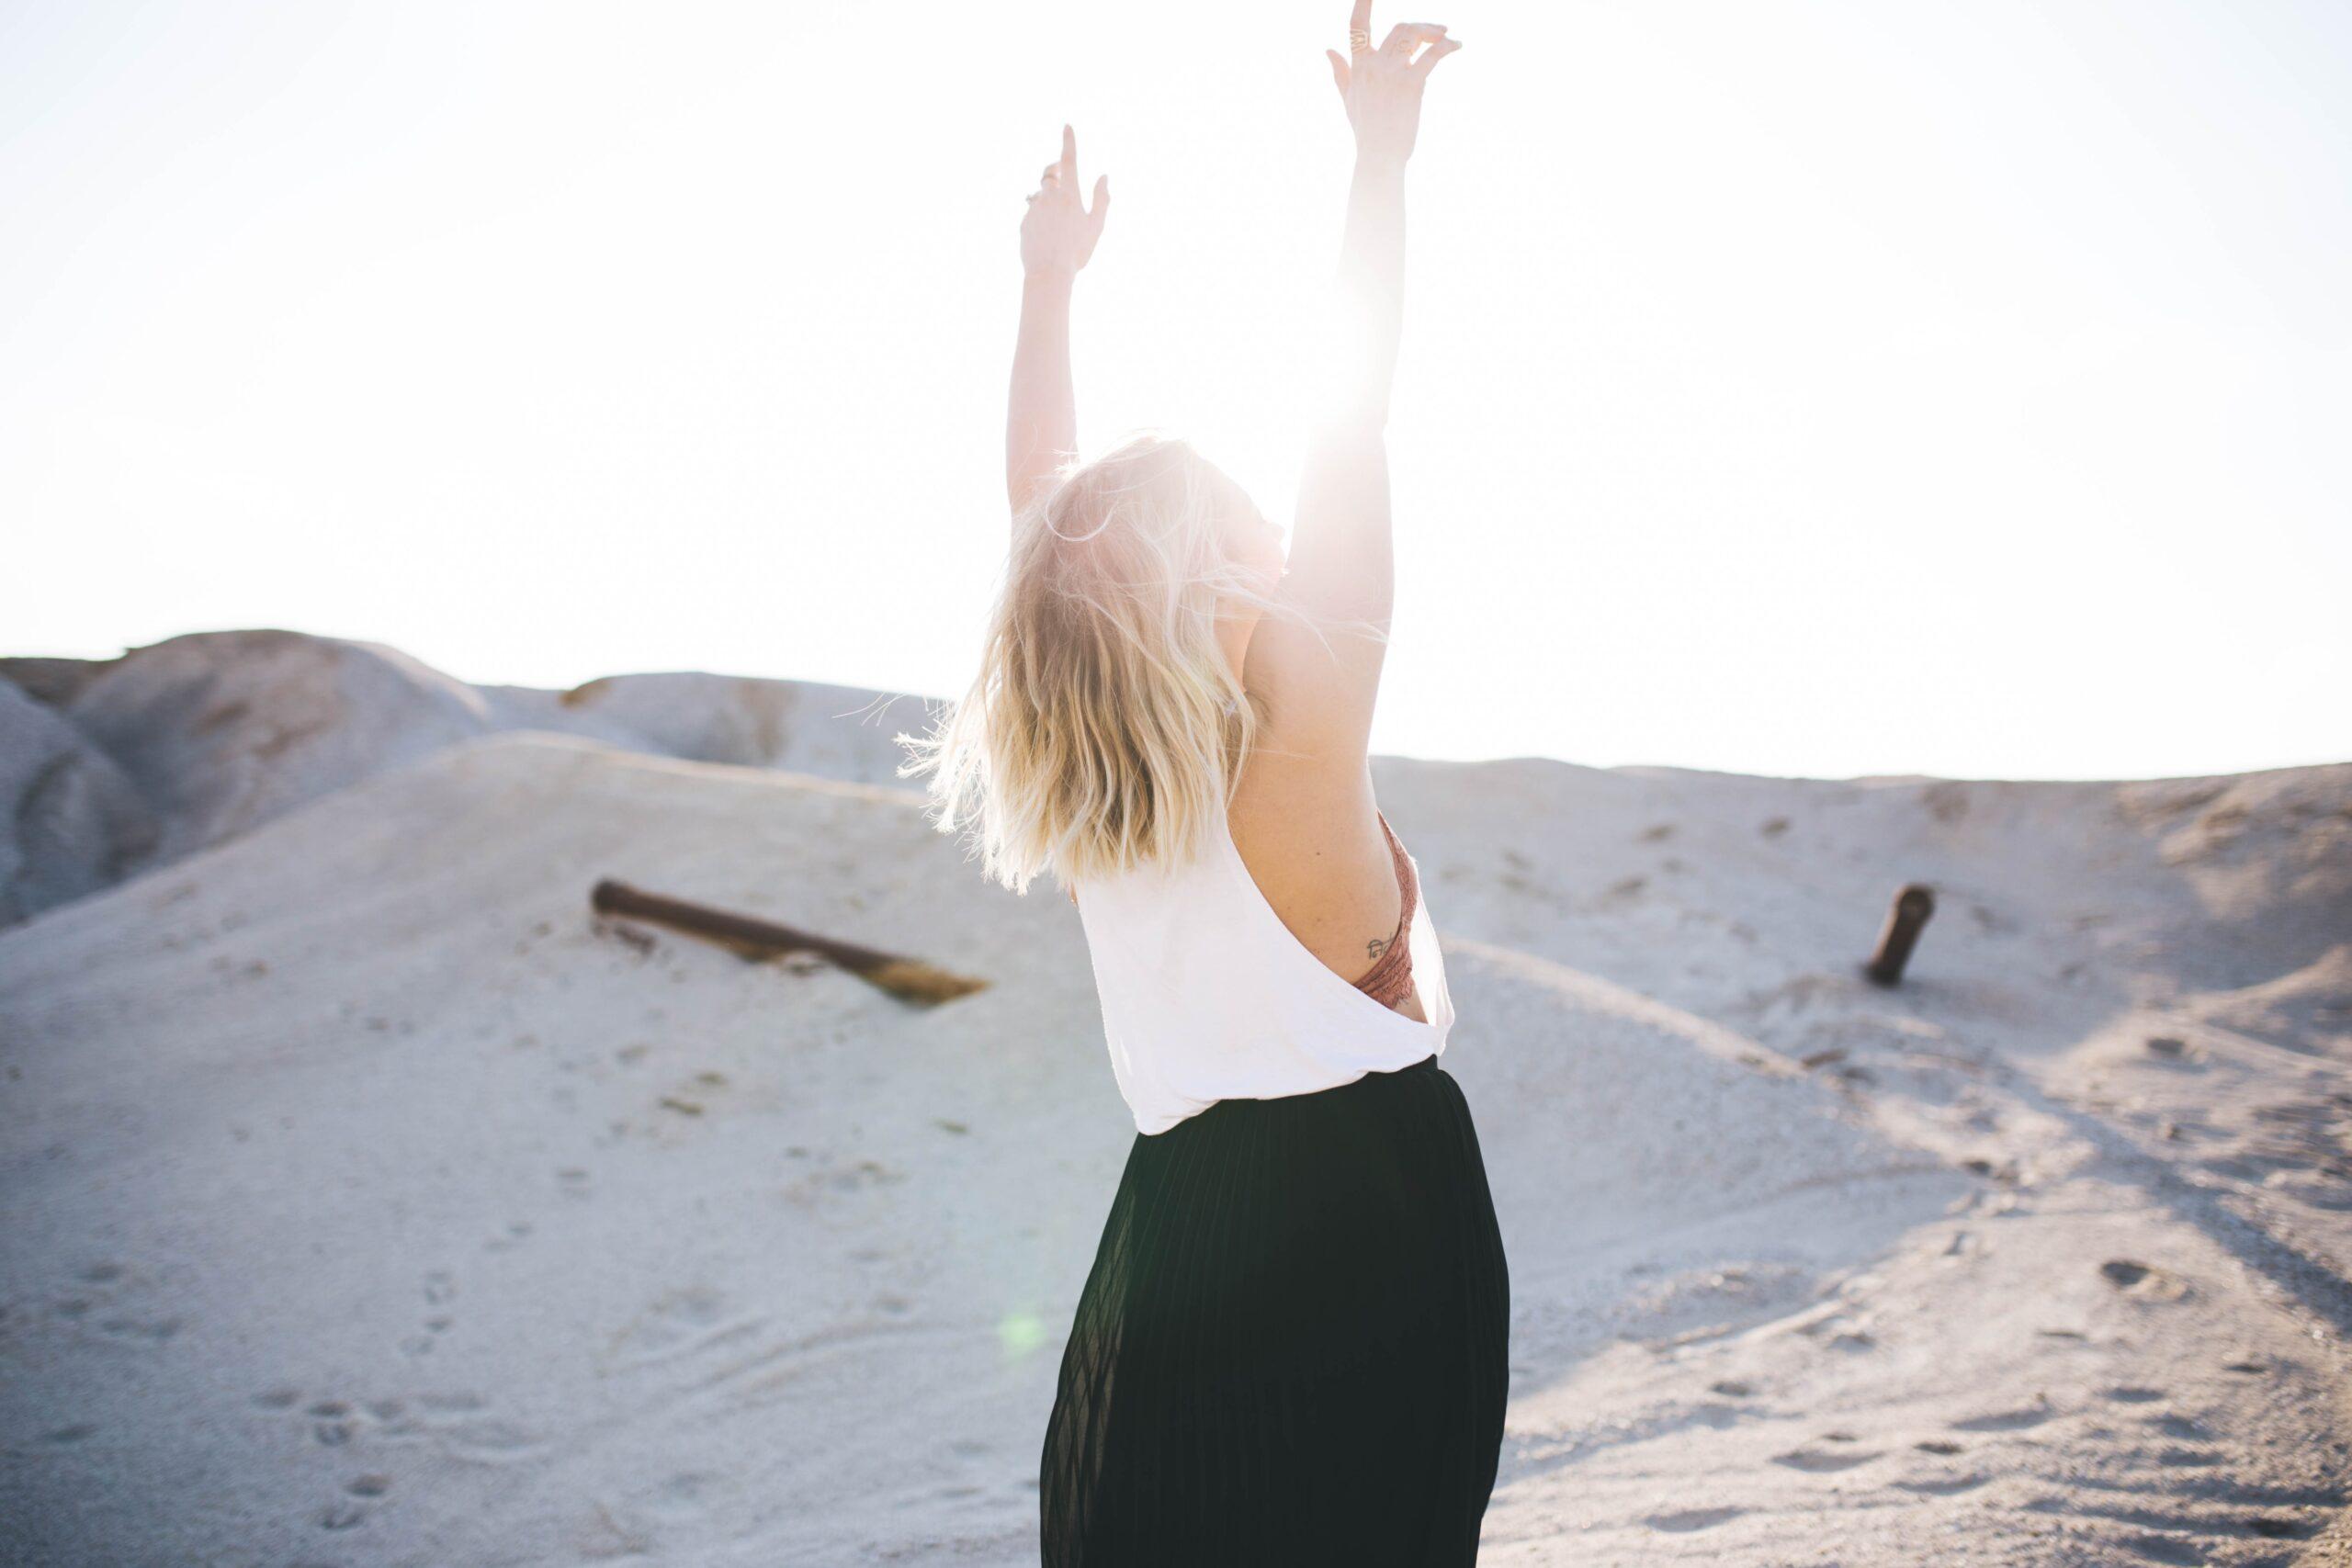 Reckless Faith Blog- How a Mini Skirt Led to Sharing The Gospel